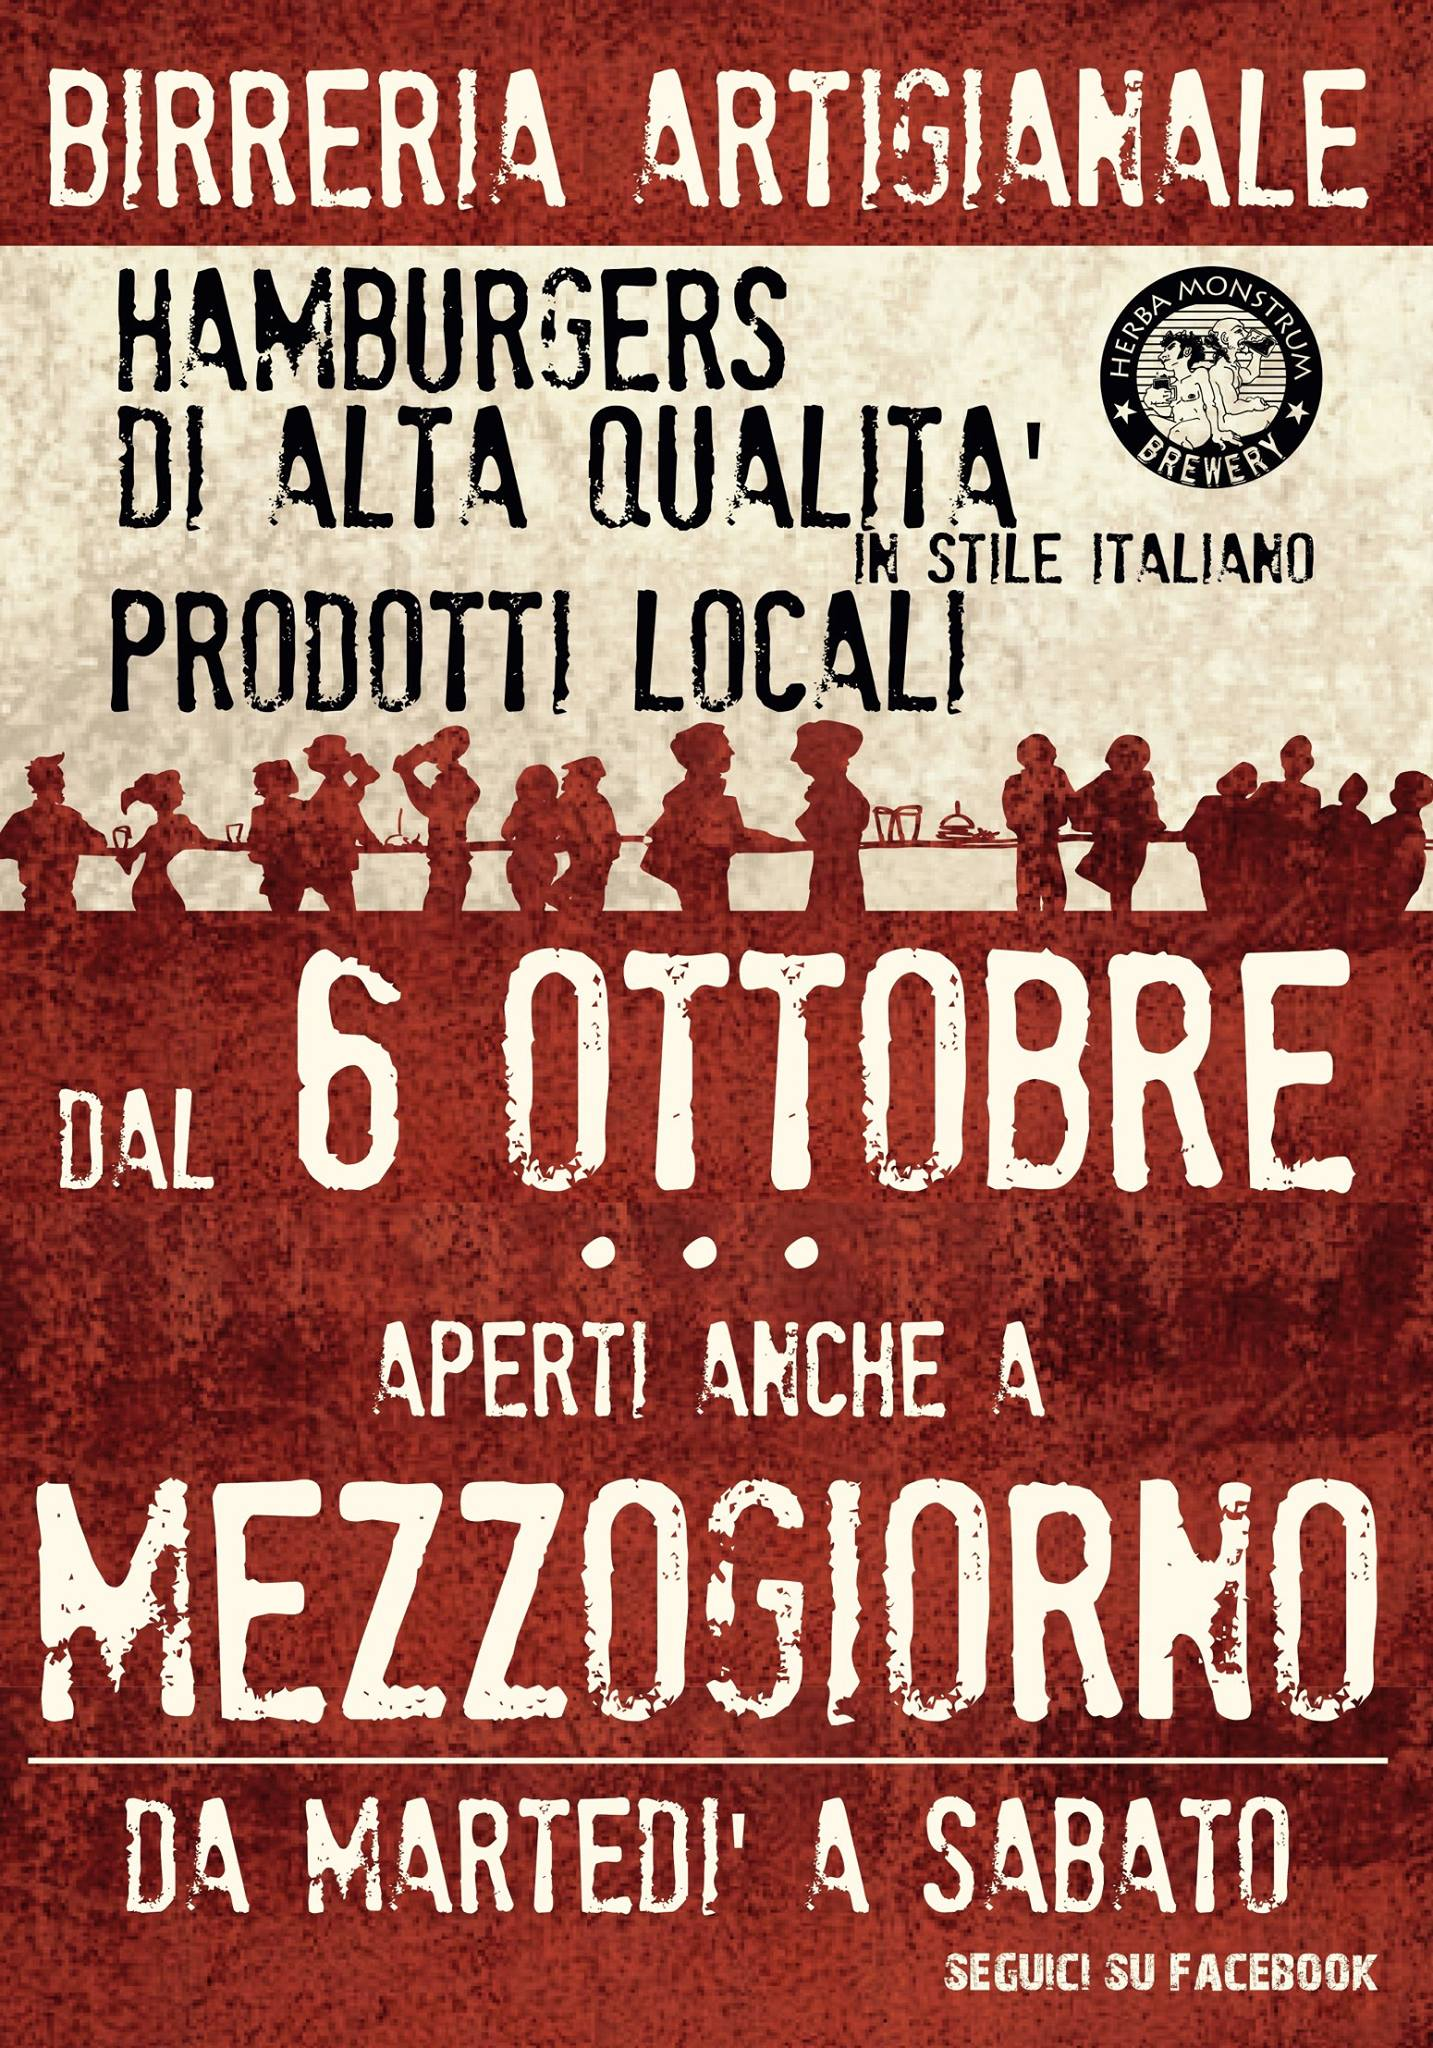 Pranzo, Menù Mezzogiorno - Herba Monstrum, Galbiate Lecco